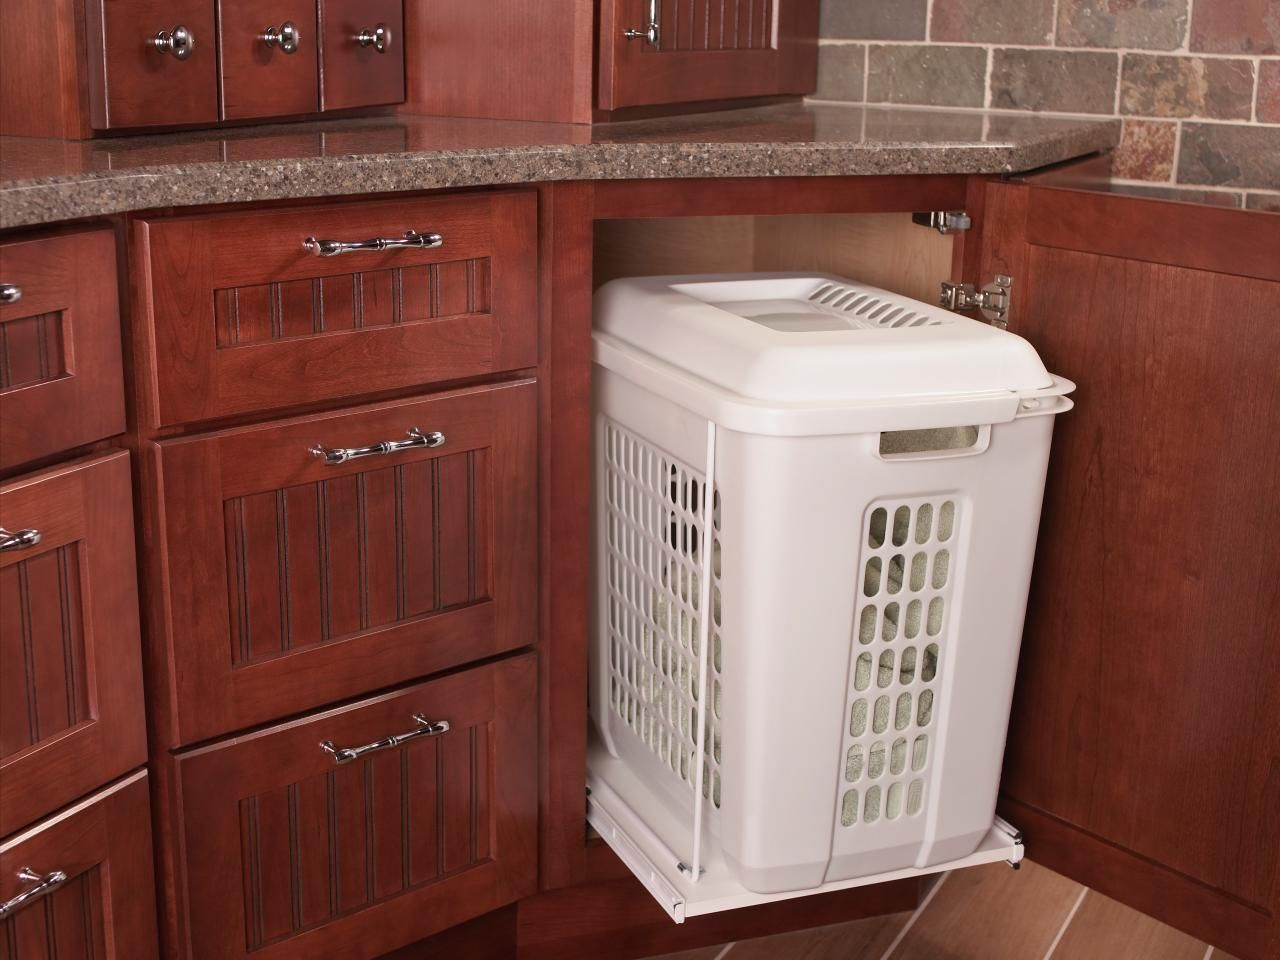 Choosing Bathroom Cabinets Bathroom Hampers Laundry In Bathroom Cabinet Styles